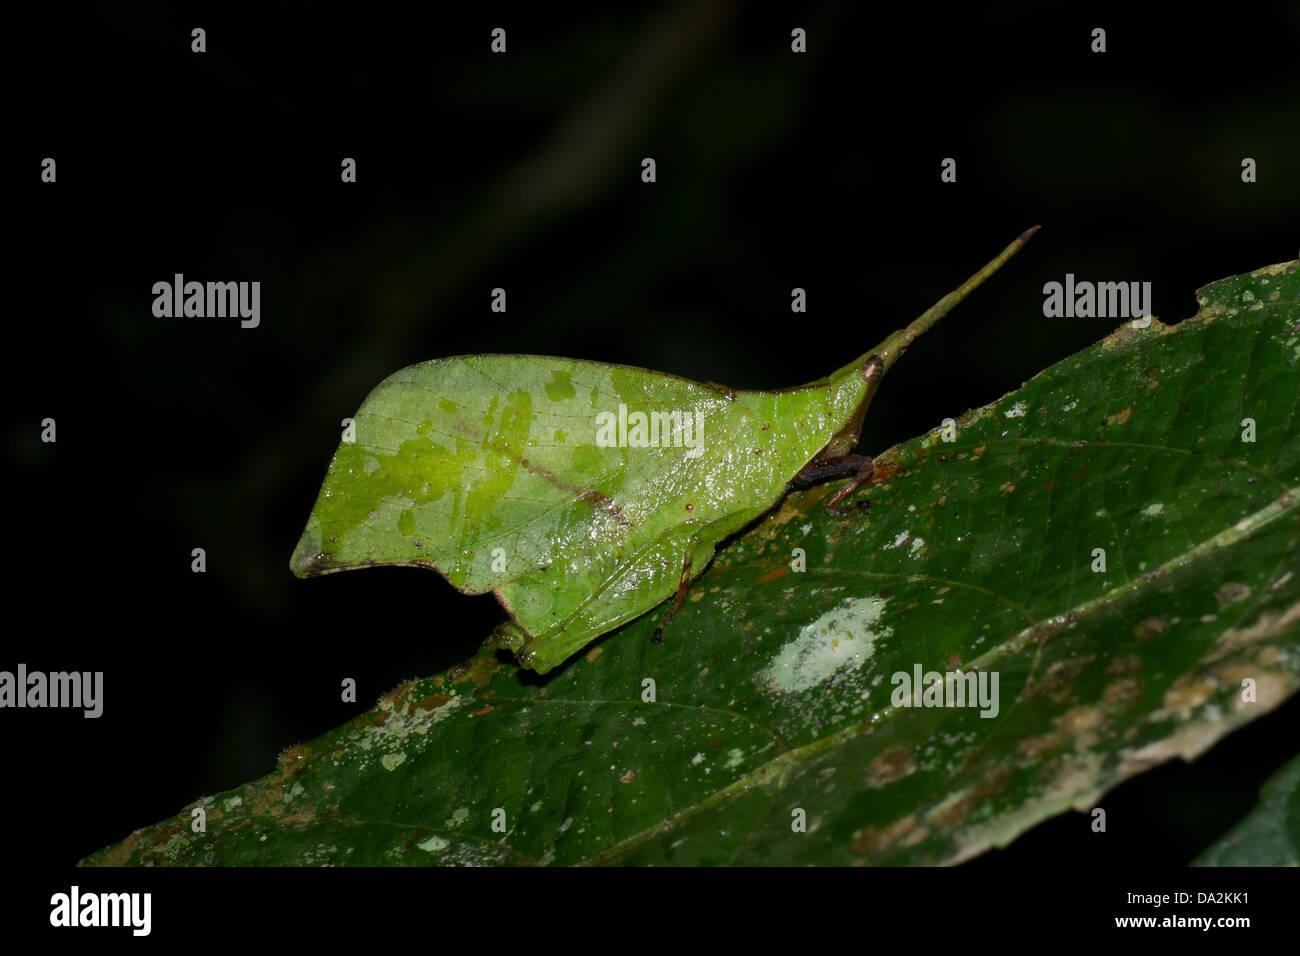 Systella Dusmeti. Leaf mimic katydid of the genus is Systella, a short-horned grasshopper (Caelifera) - Stock Image